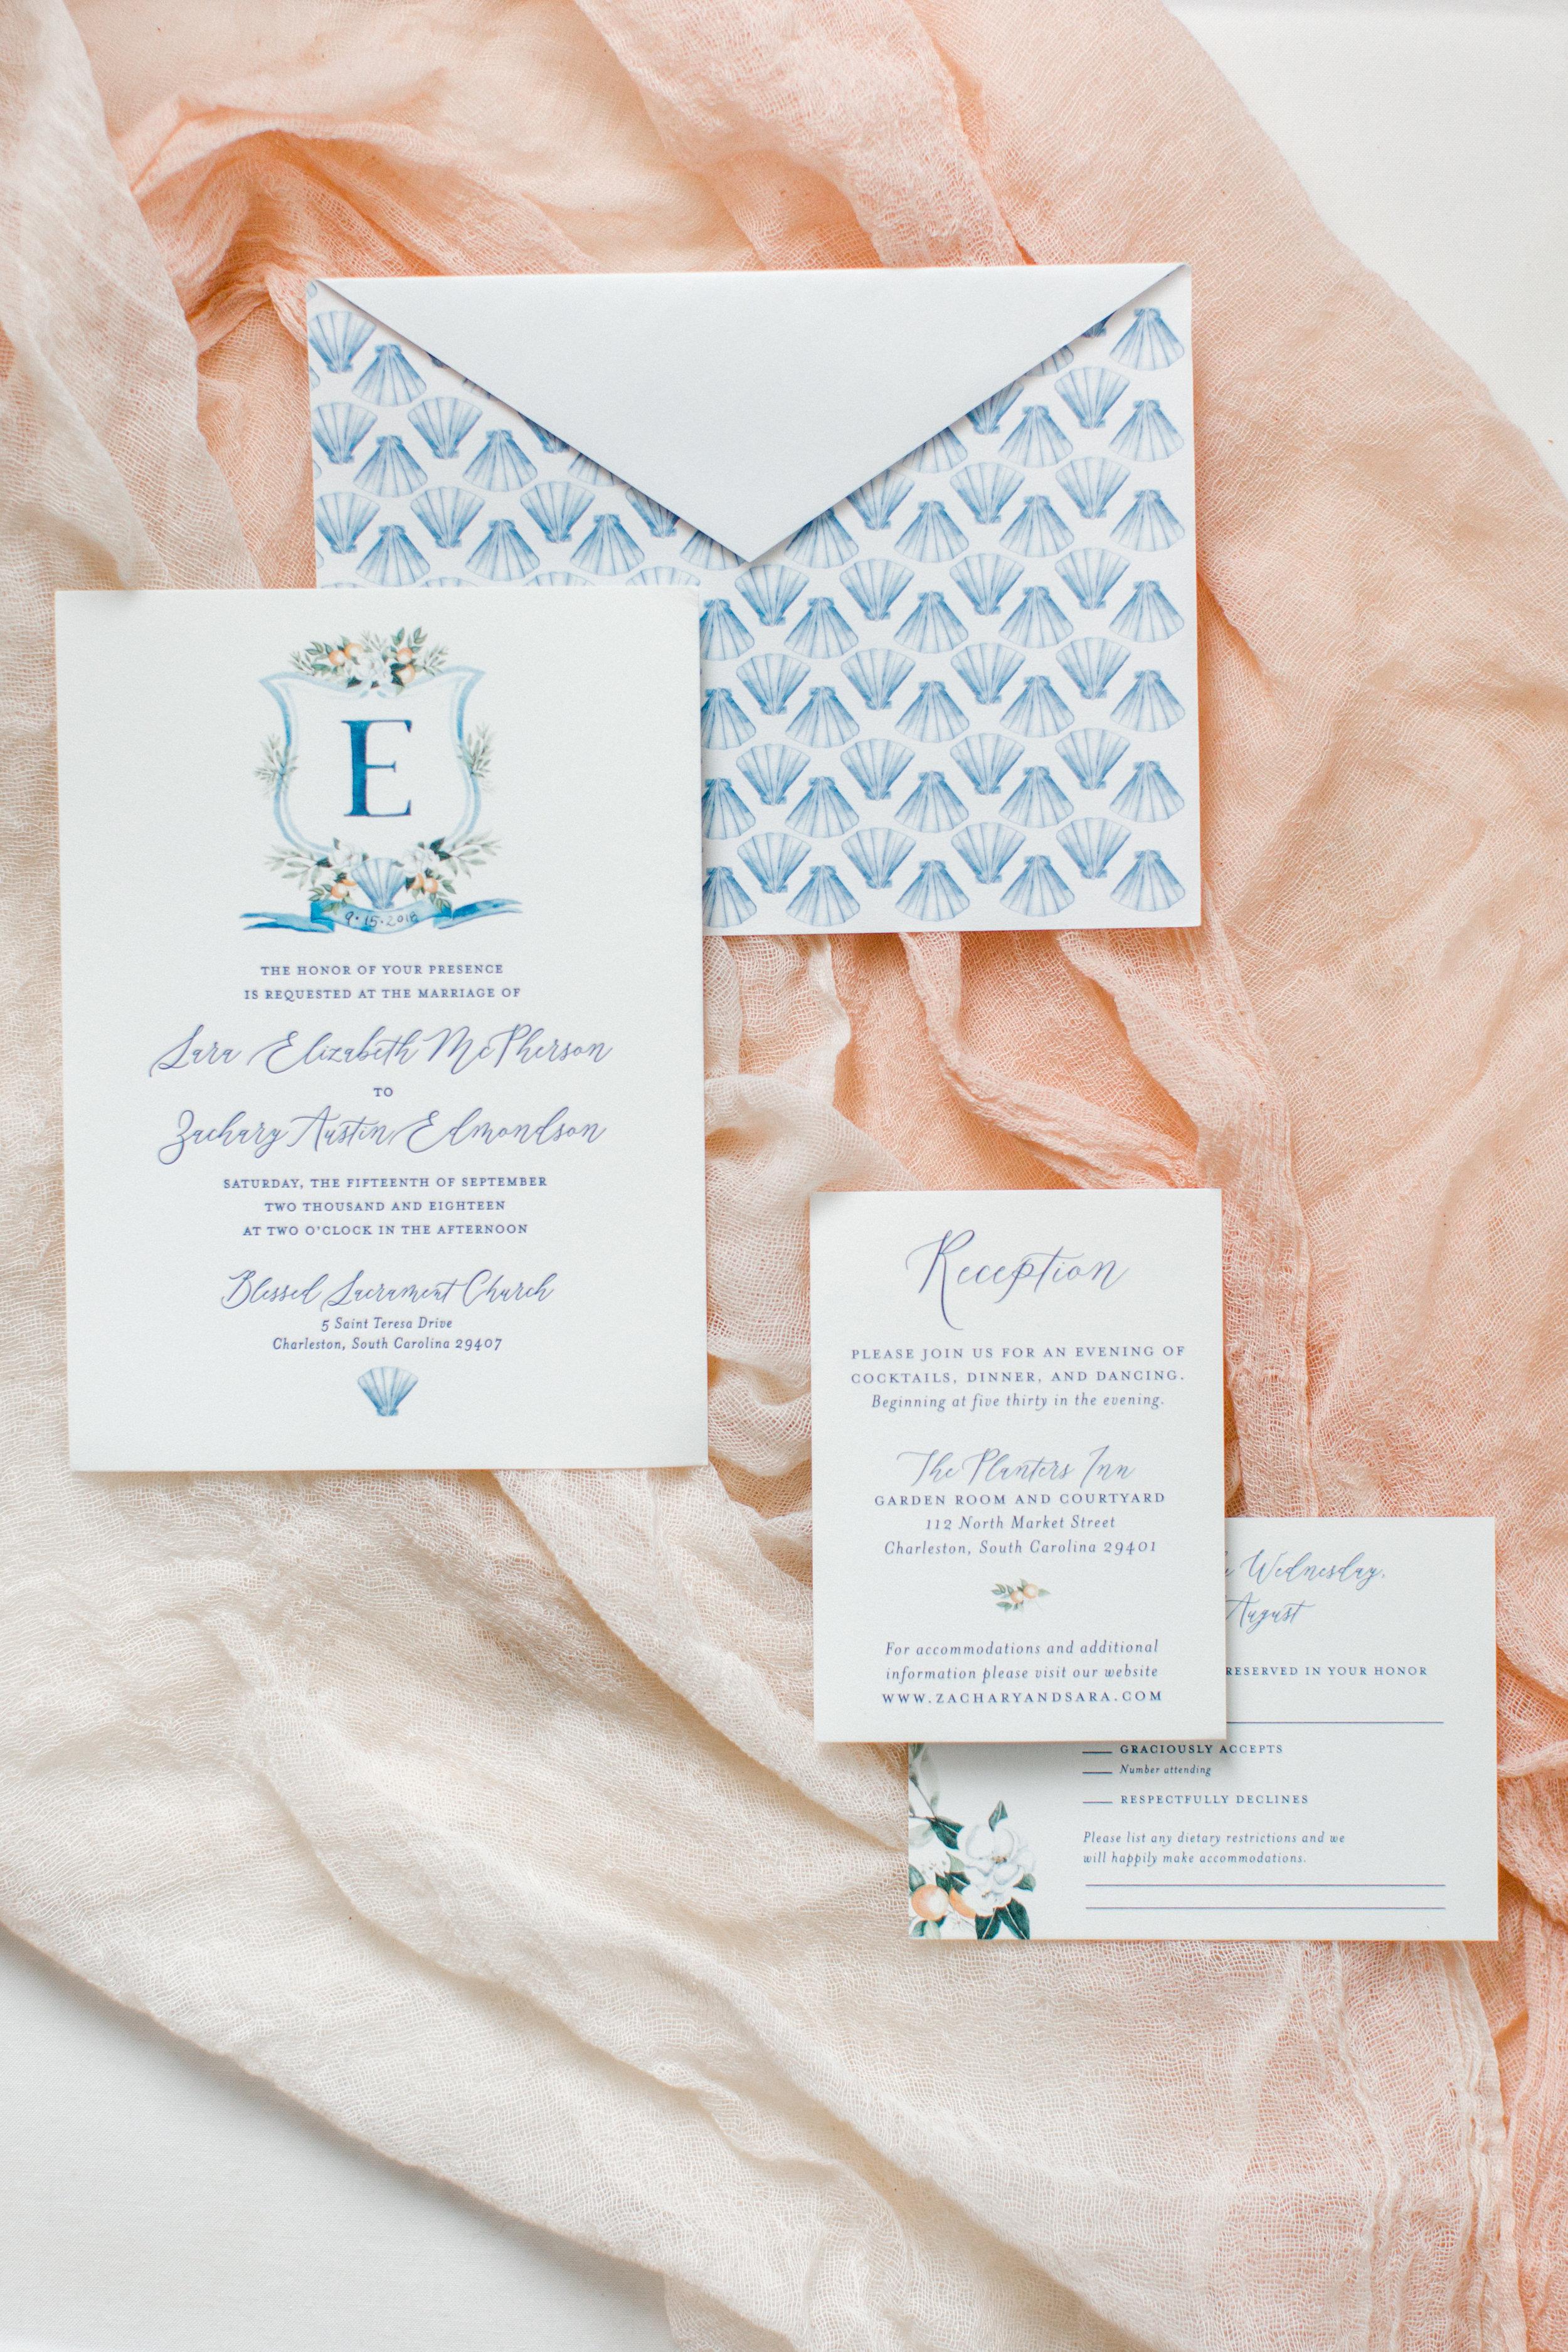 blush invitation suite by sas-e ink